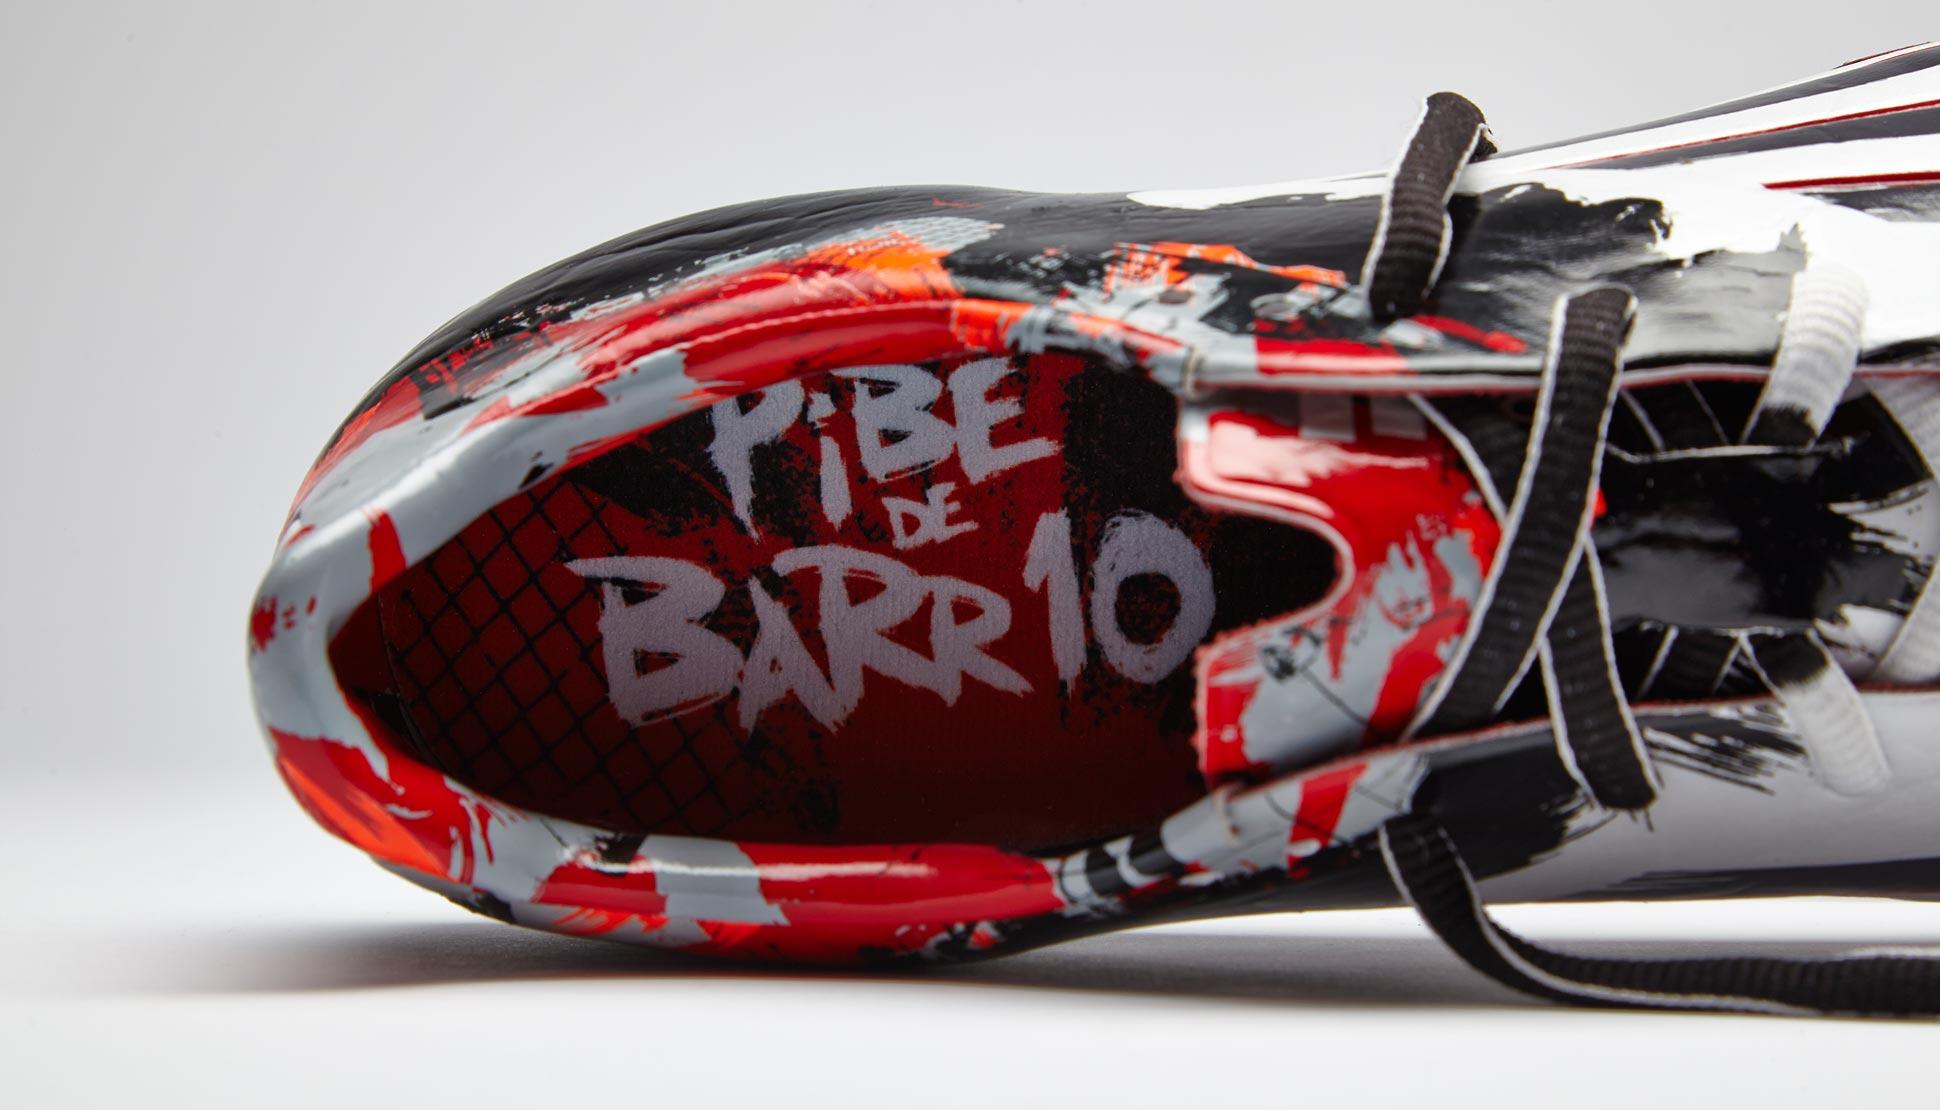 Бутсы Adidas F50 Adizero Pibe de Barr10